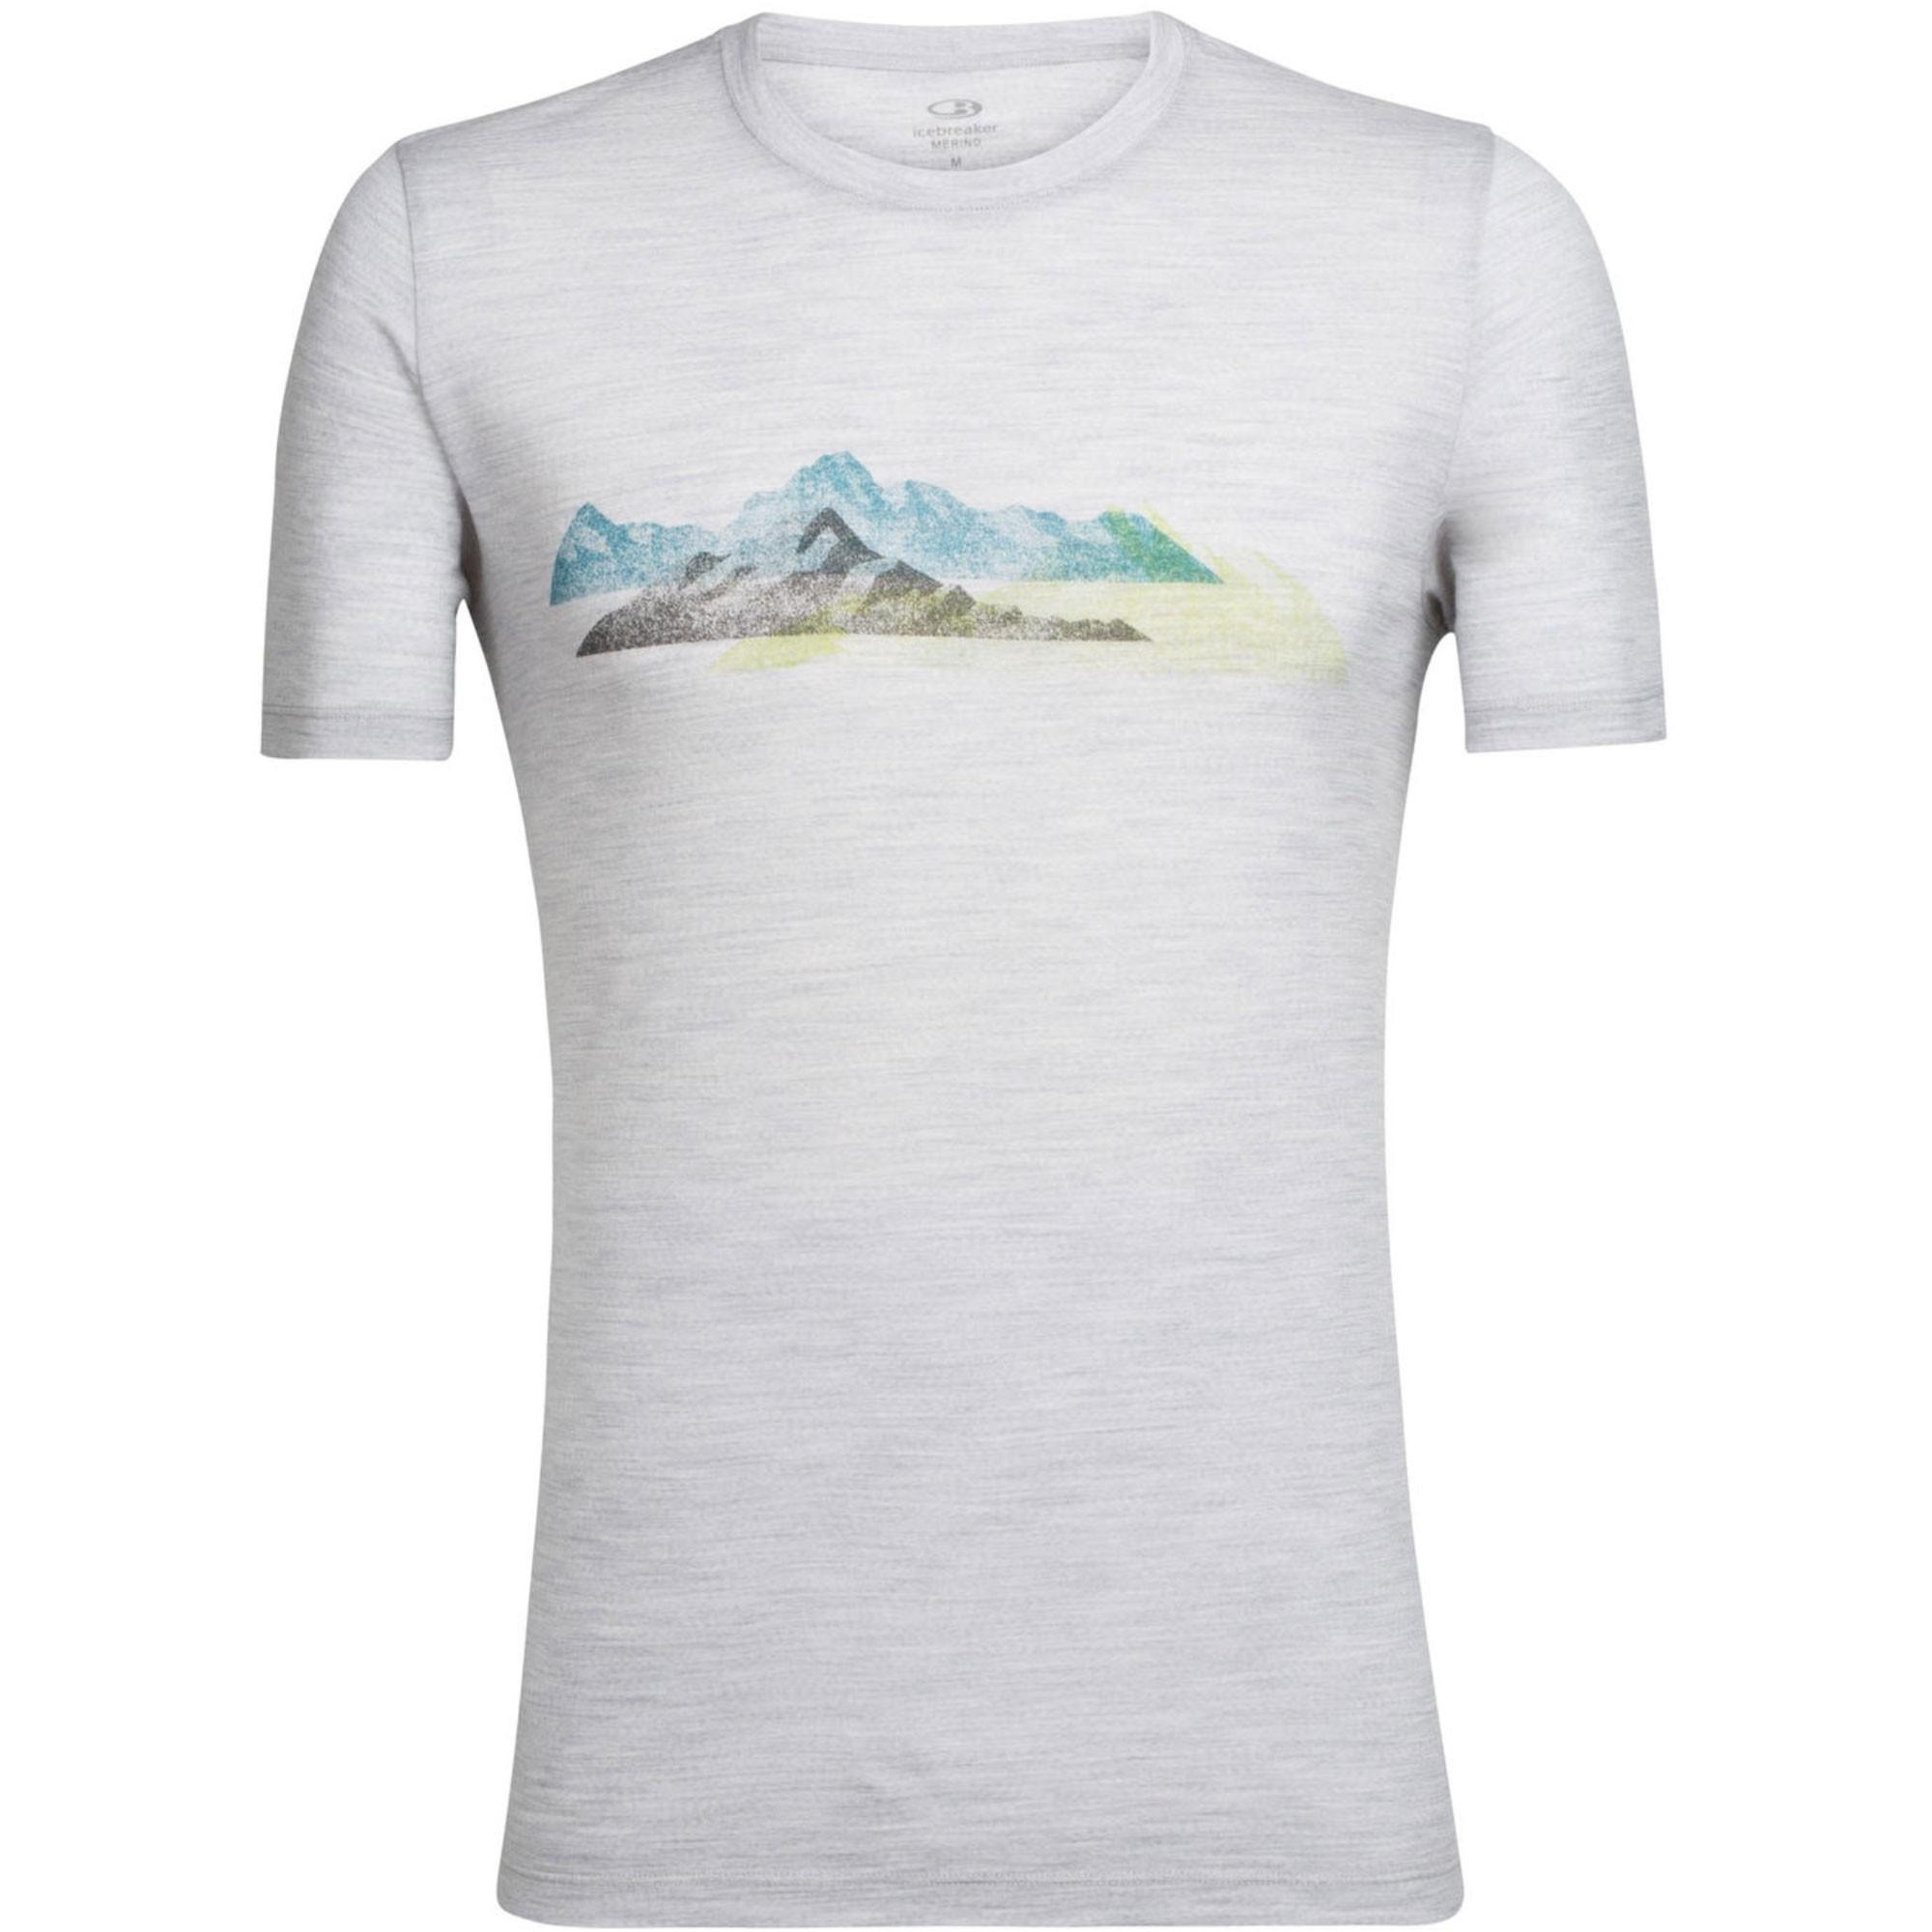 Icebreaker Tech Lite SS Crewe T-Shirt - Misty Peak - Blizzard Heather